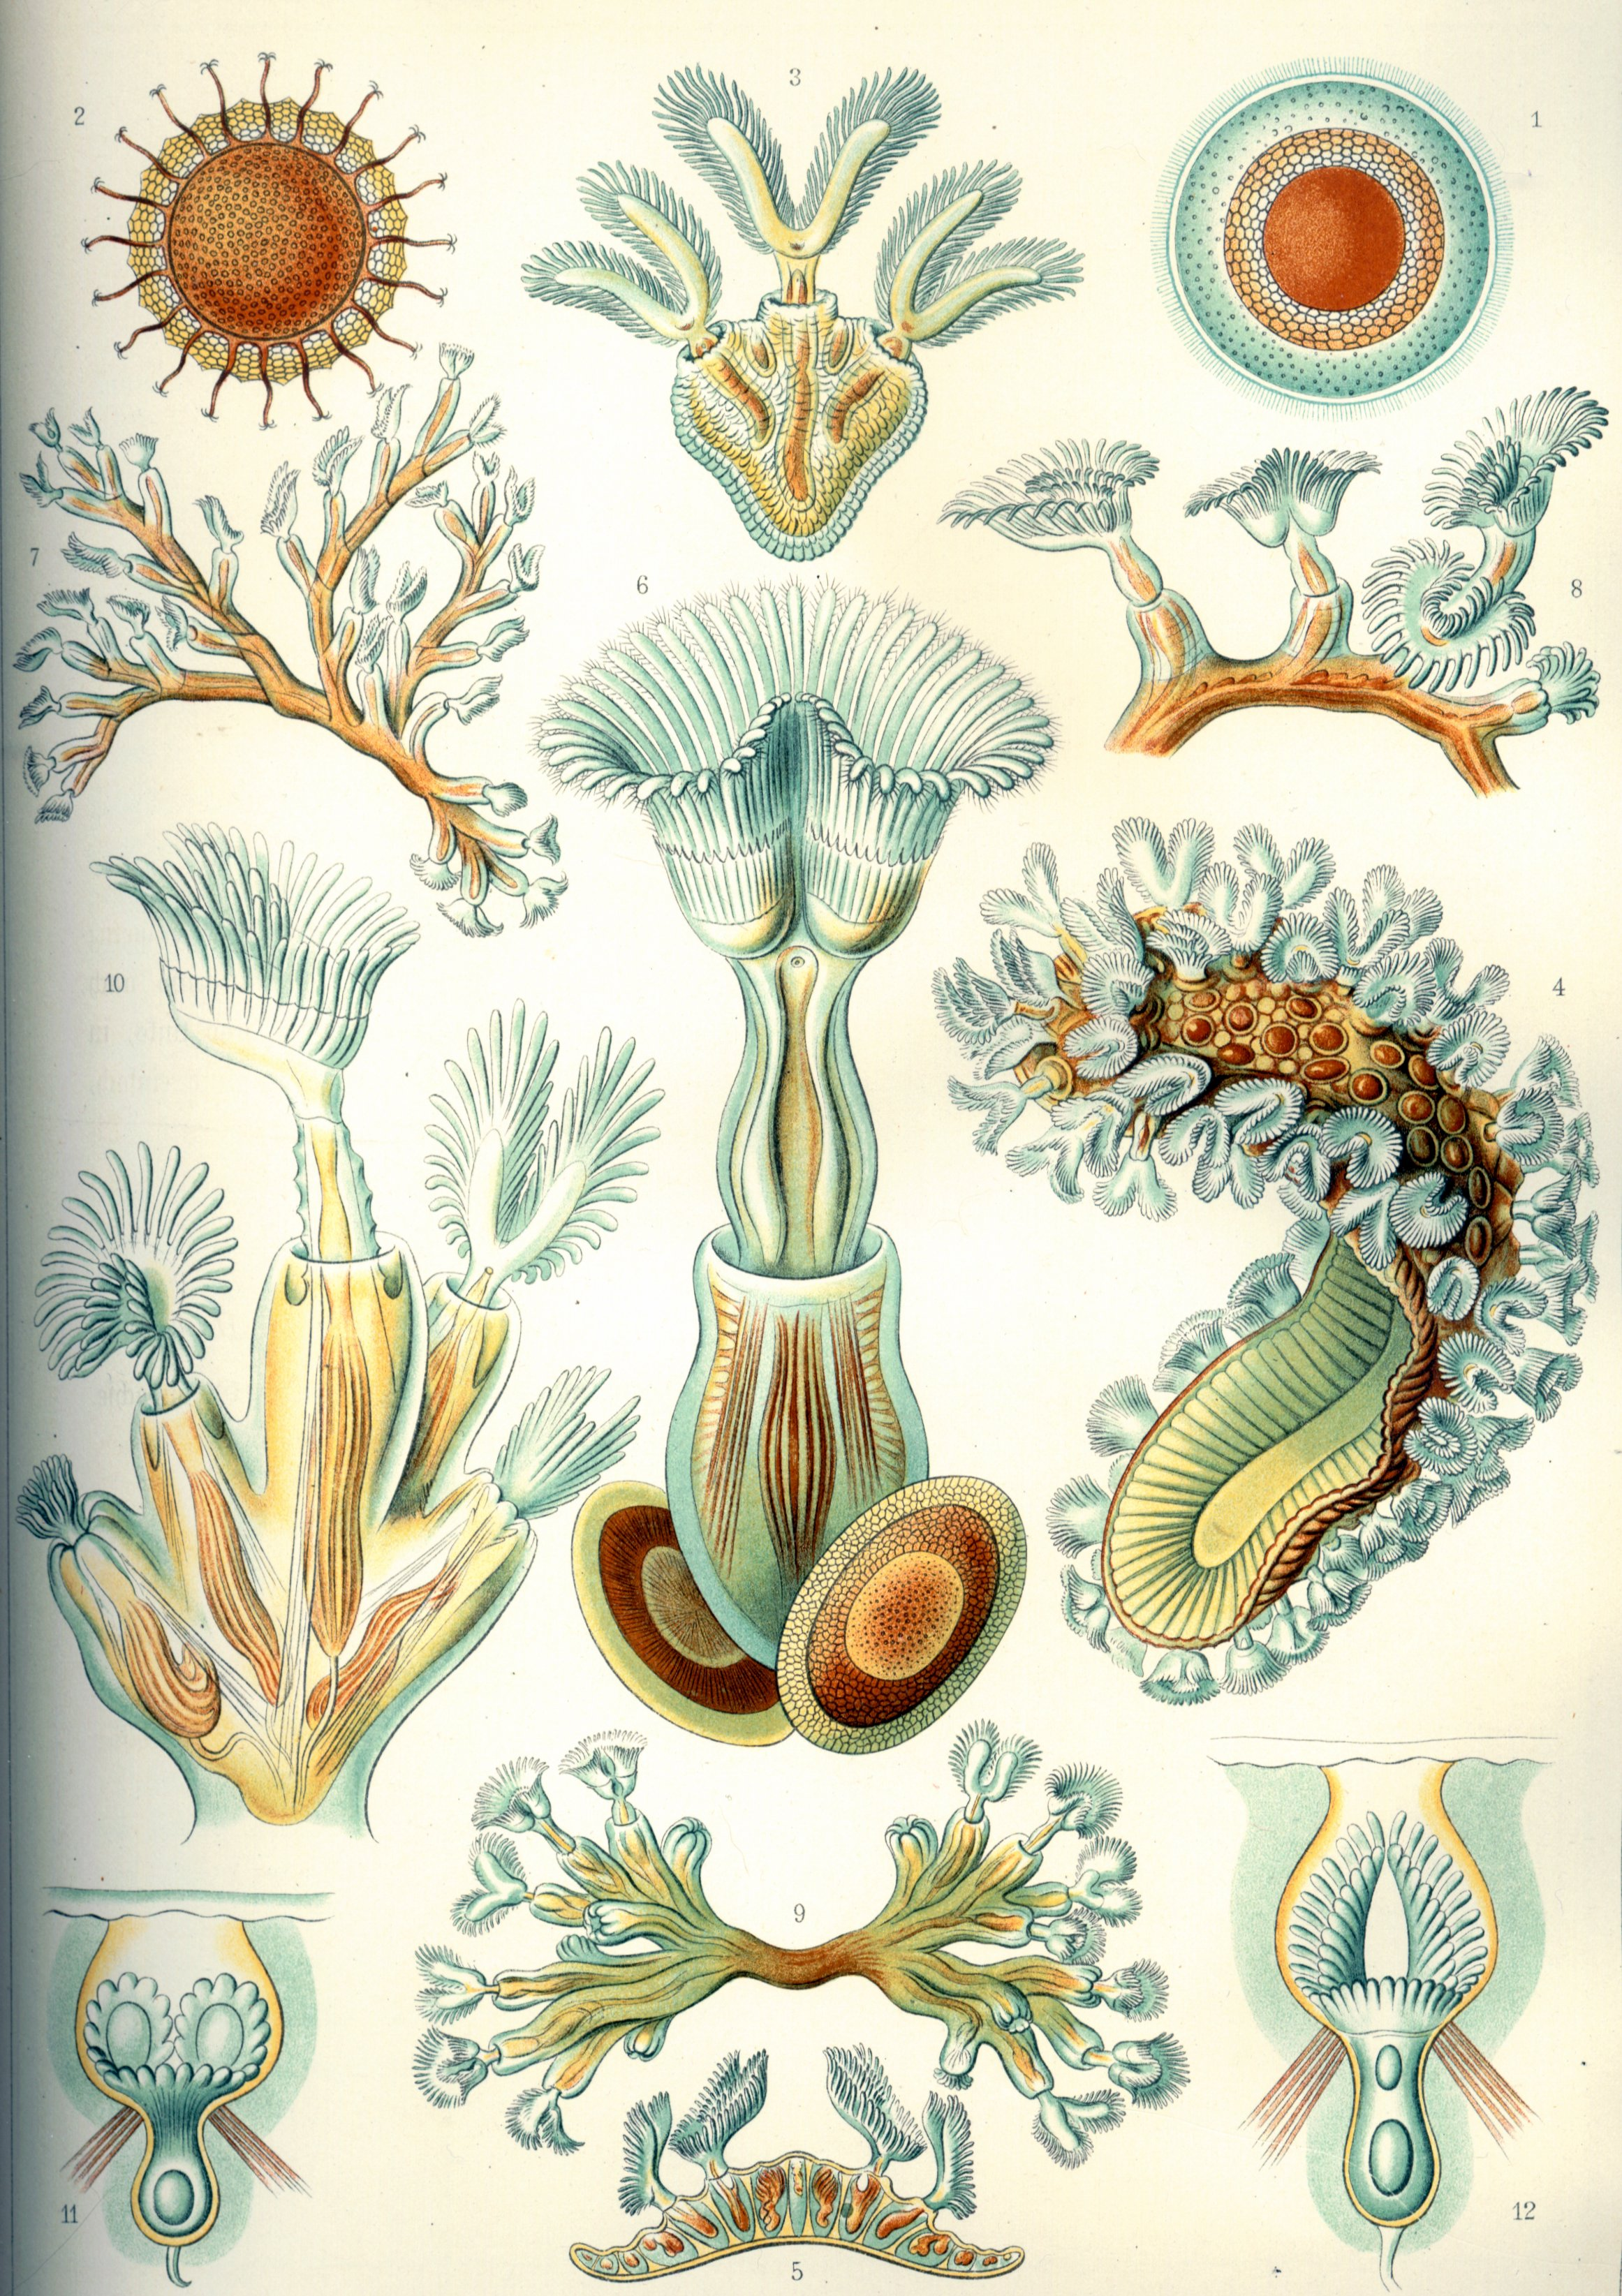 Haeckel Bryozoa.jpg